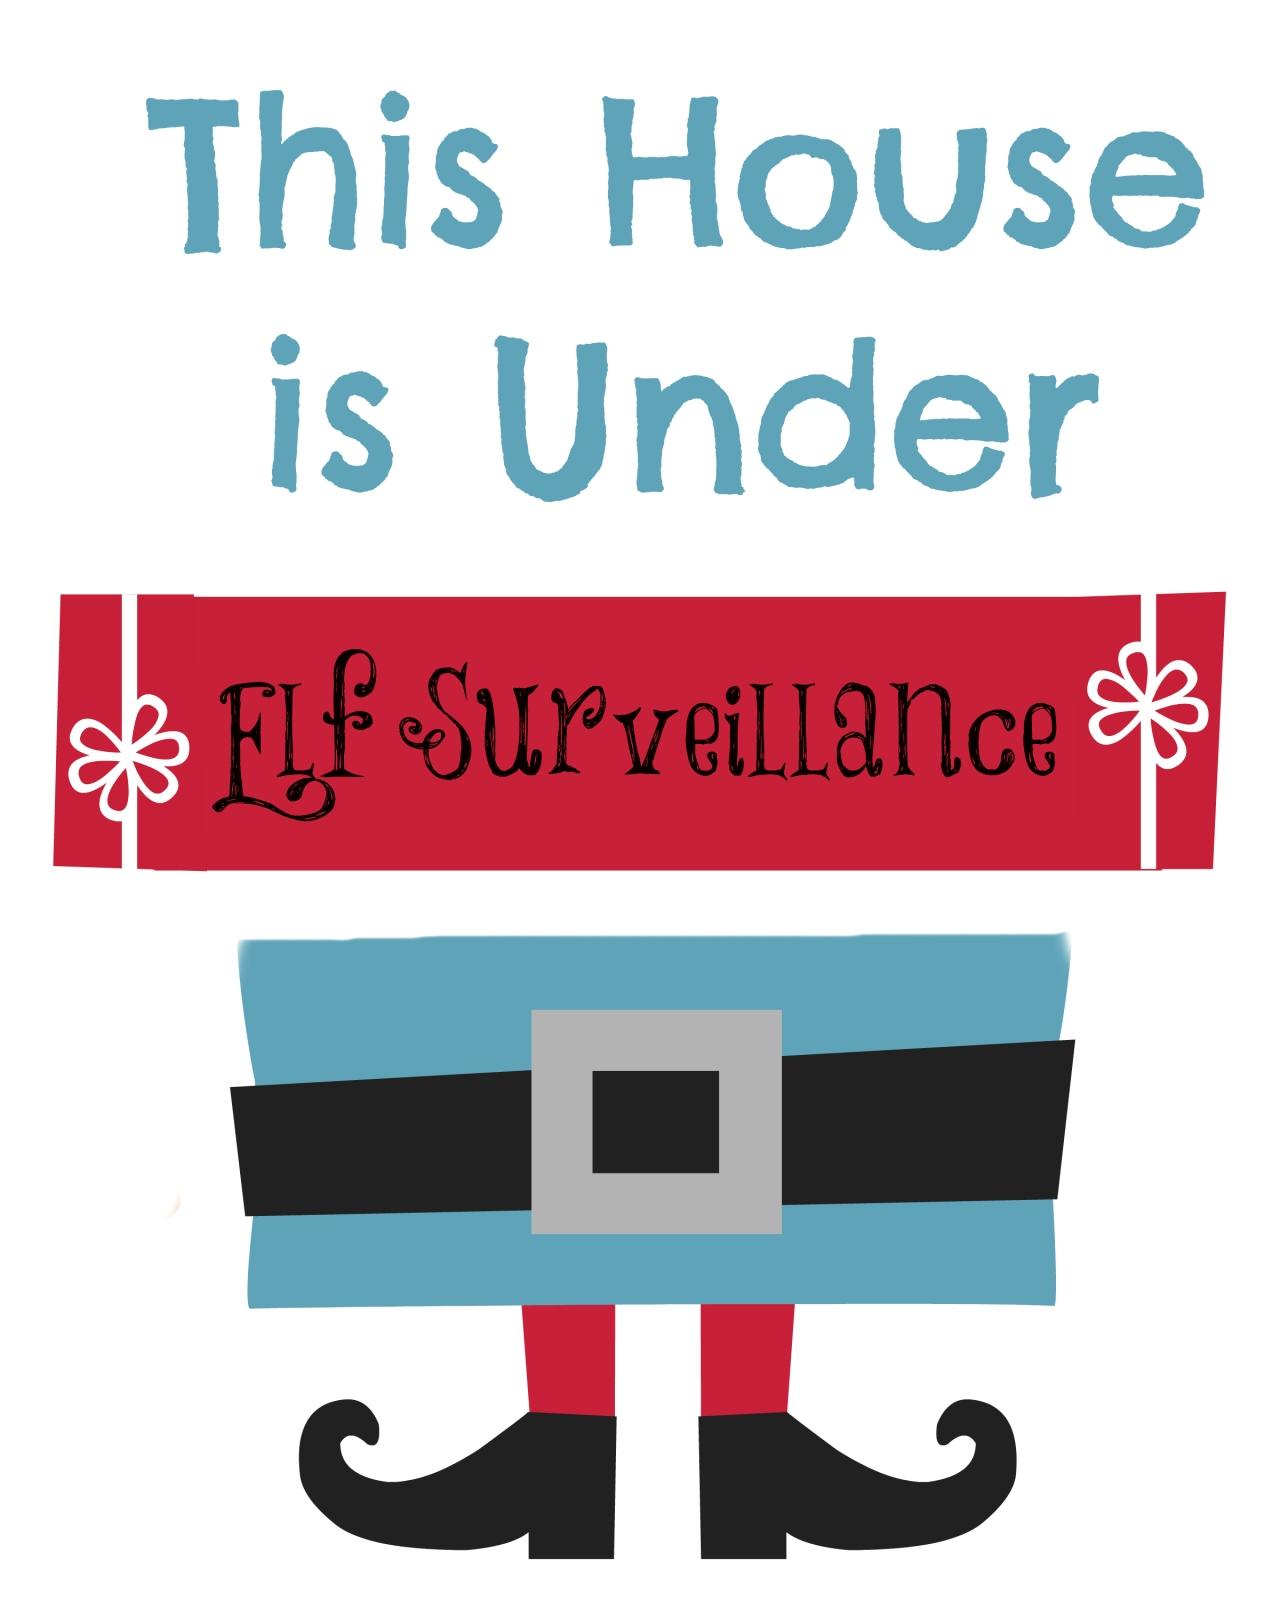 Elf on the Shelf | Elf SurveillancePrintable